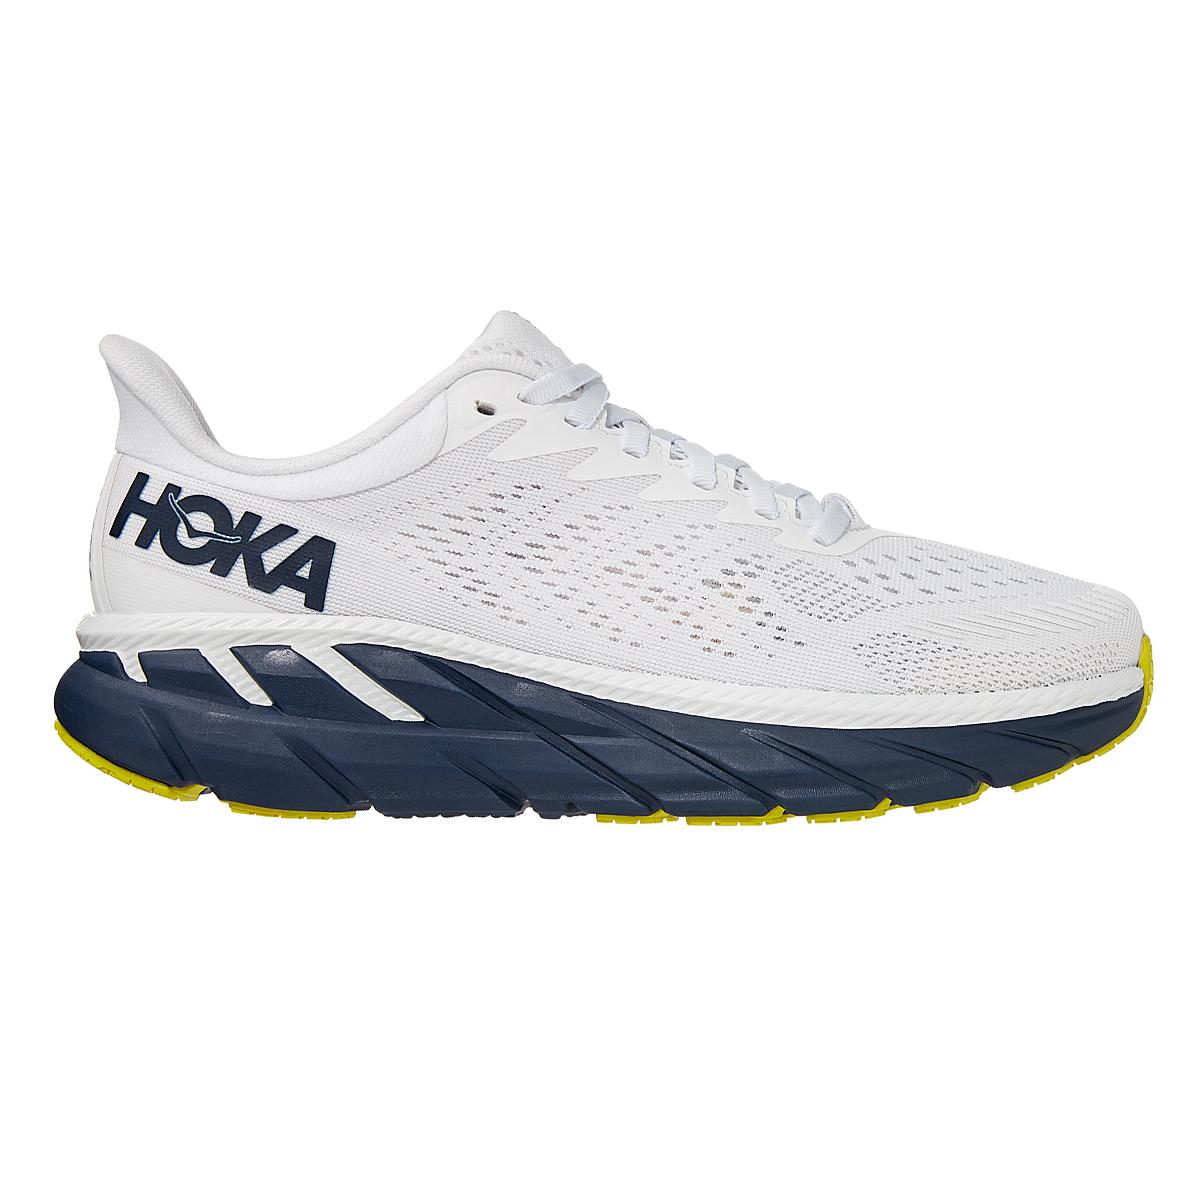 Women's Hoka One One Clifton 7 Running Shoe - Color: Blanc De Blanc - Size: 5 - Width: Regular, Blanc De Blanc, large, image 1